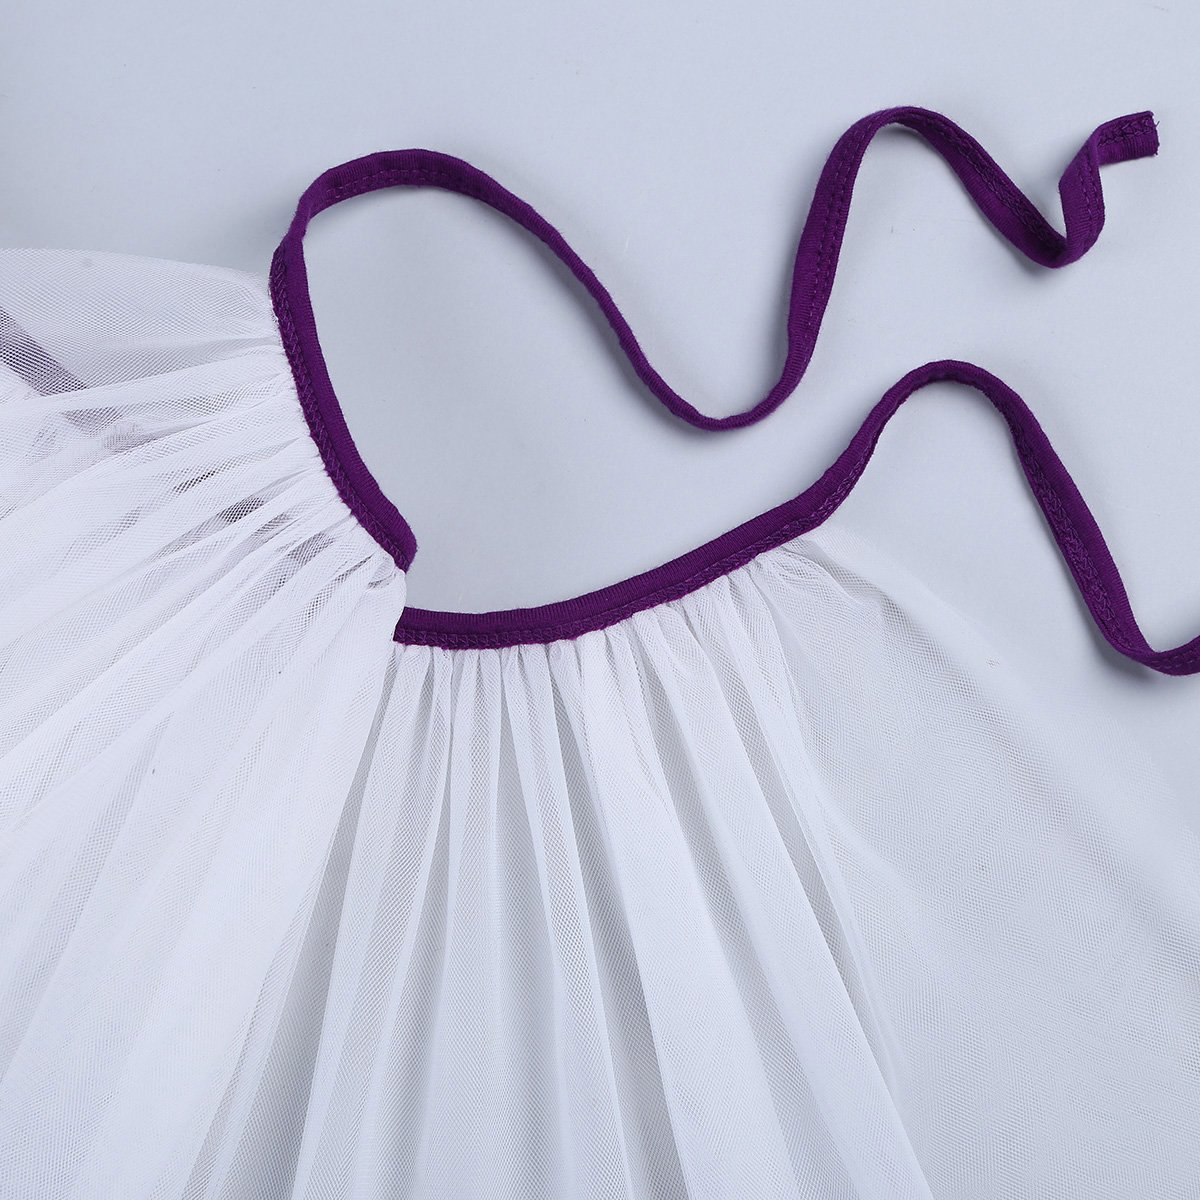 Freebily Girls Cotton Spaghetti Shoulder Straps Ballet Dance Gymnastics Leotard with Mesh Tied Skirt Outfit Set